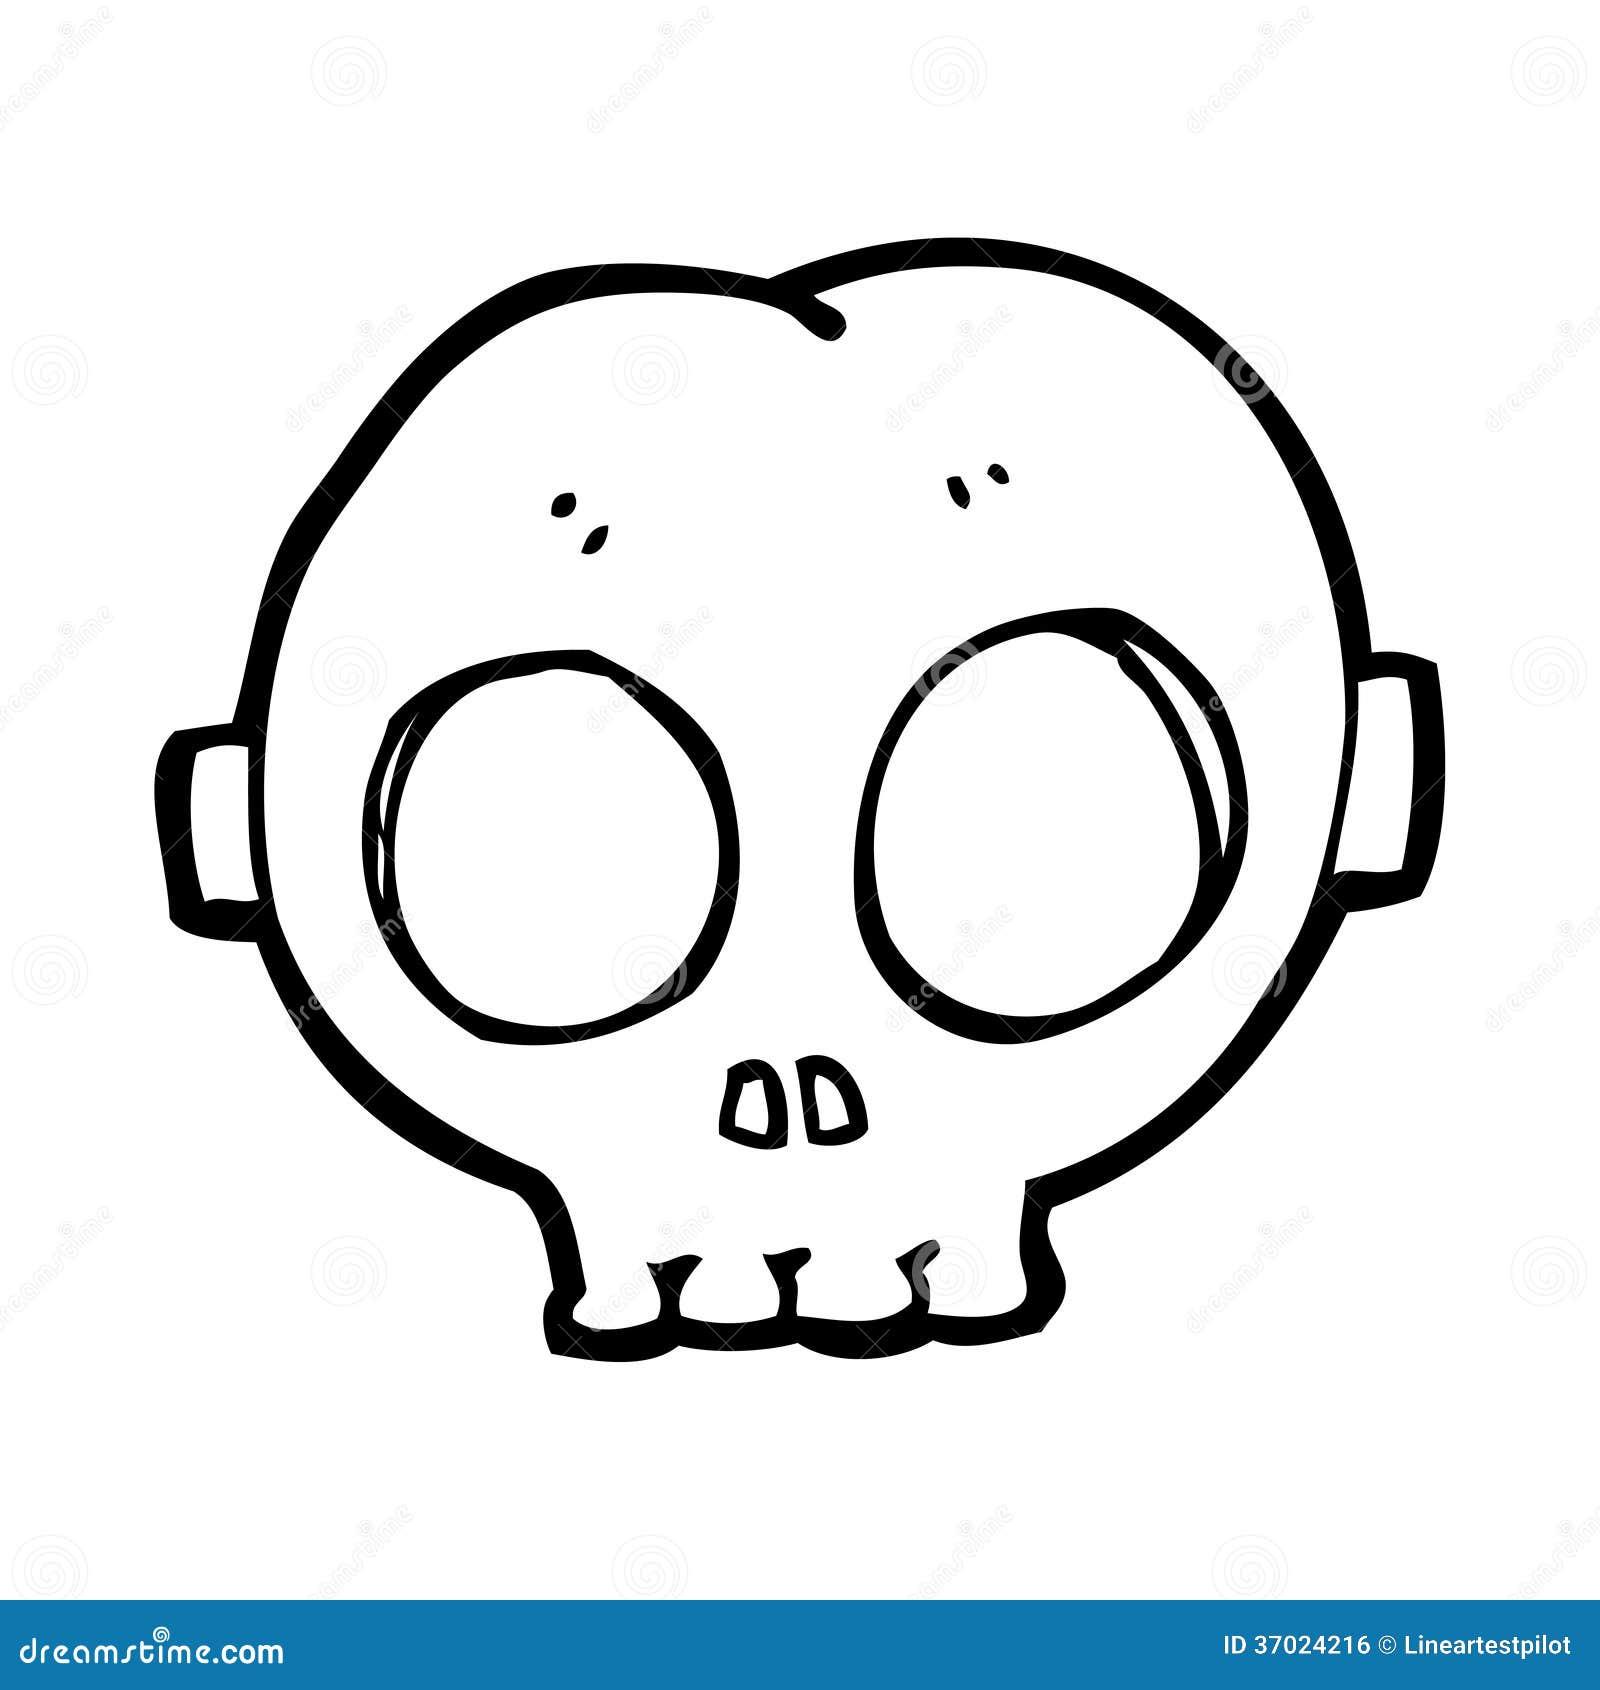 Cartoon Halloween Skull Mask Royalty Free Stock Image - Image ...